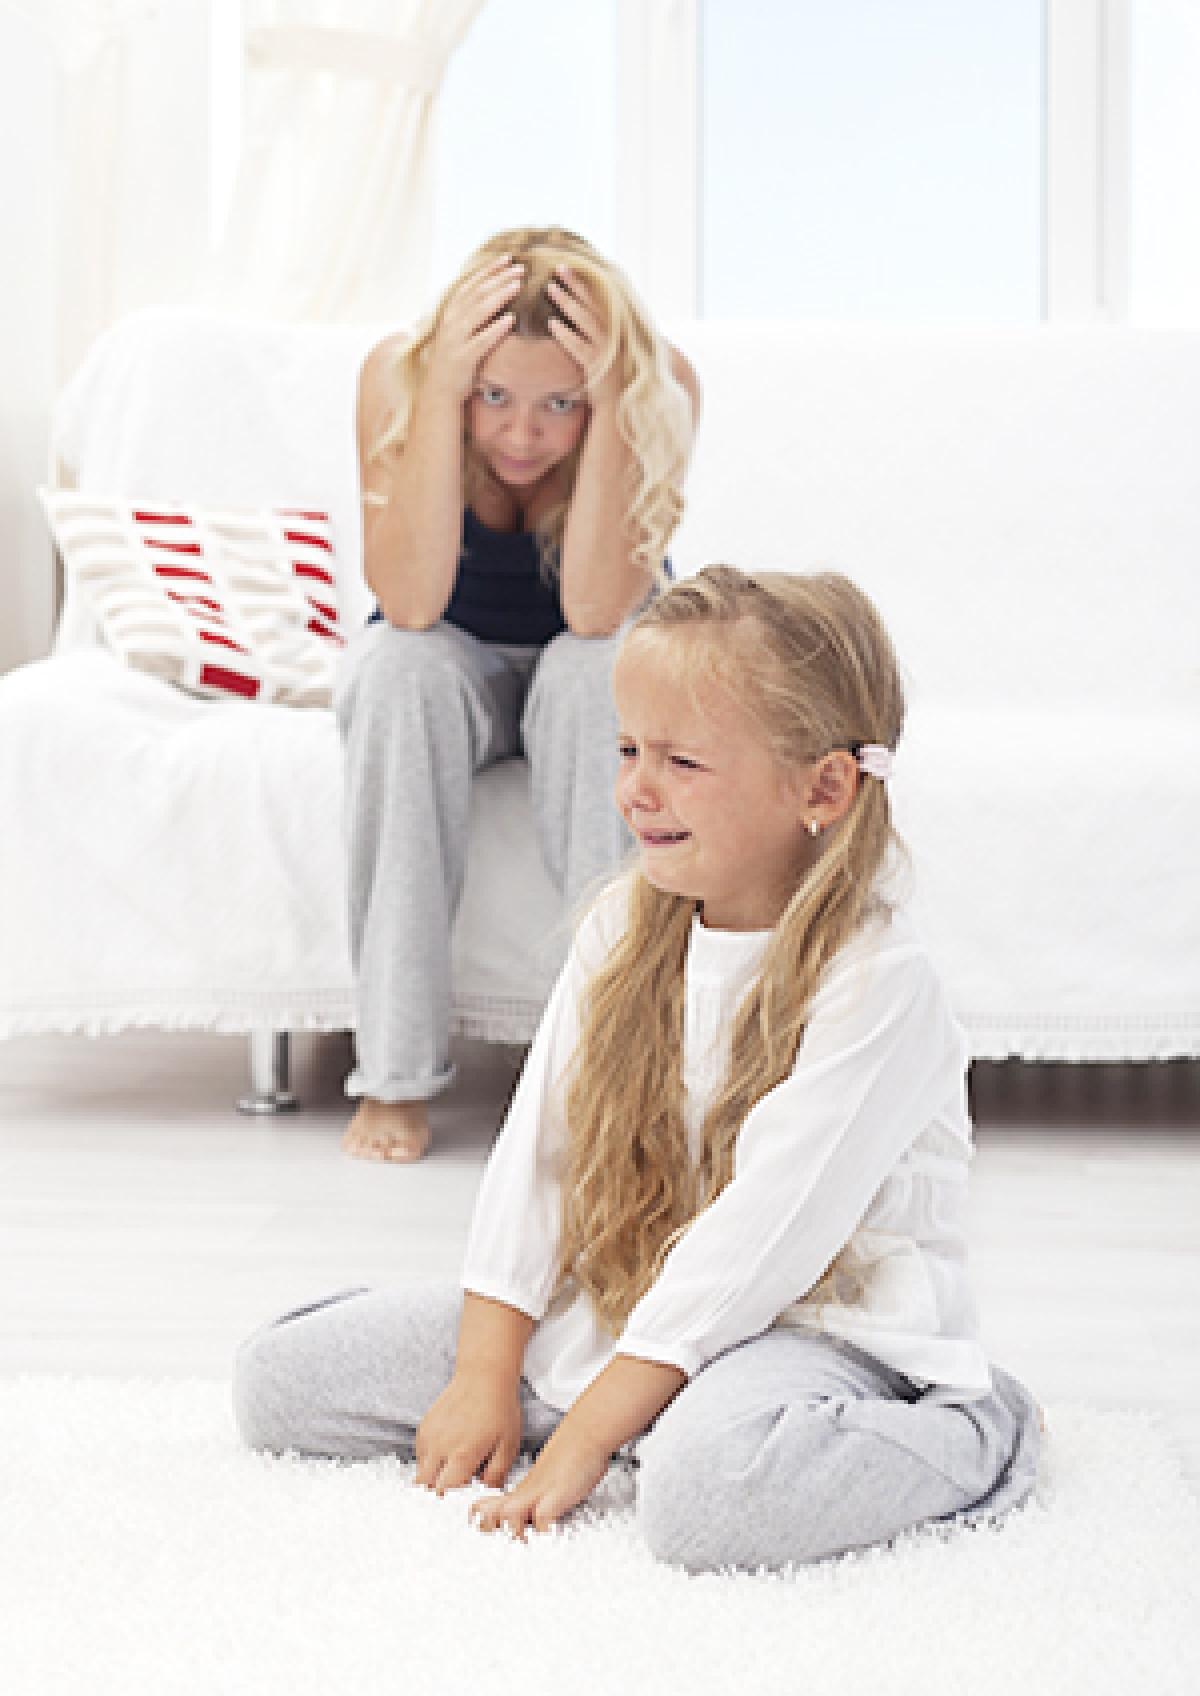 Irregular bedtimes lead to behavioural problems in kids